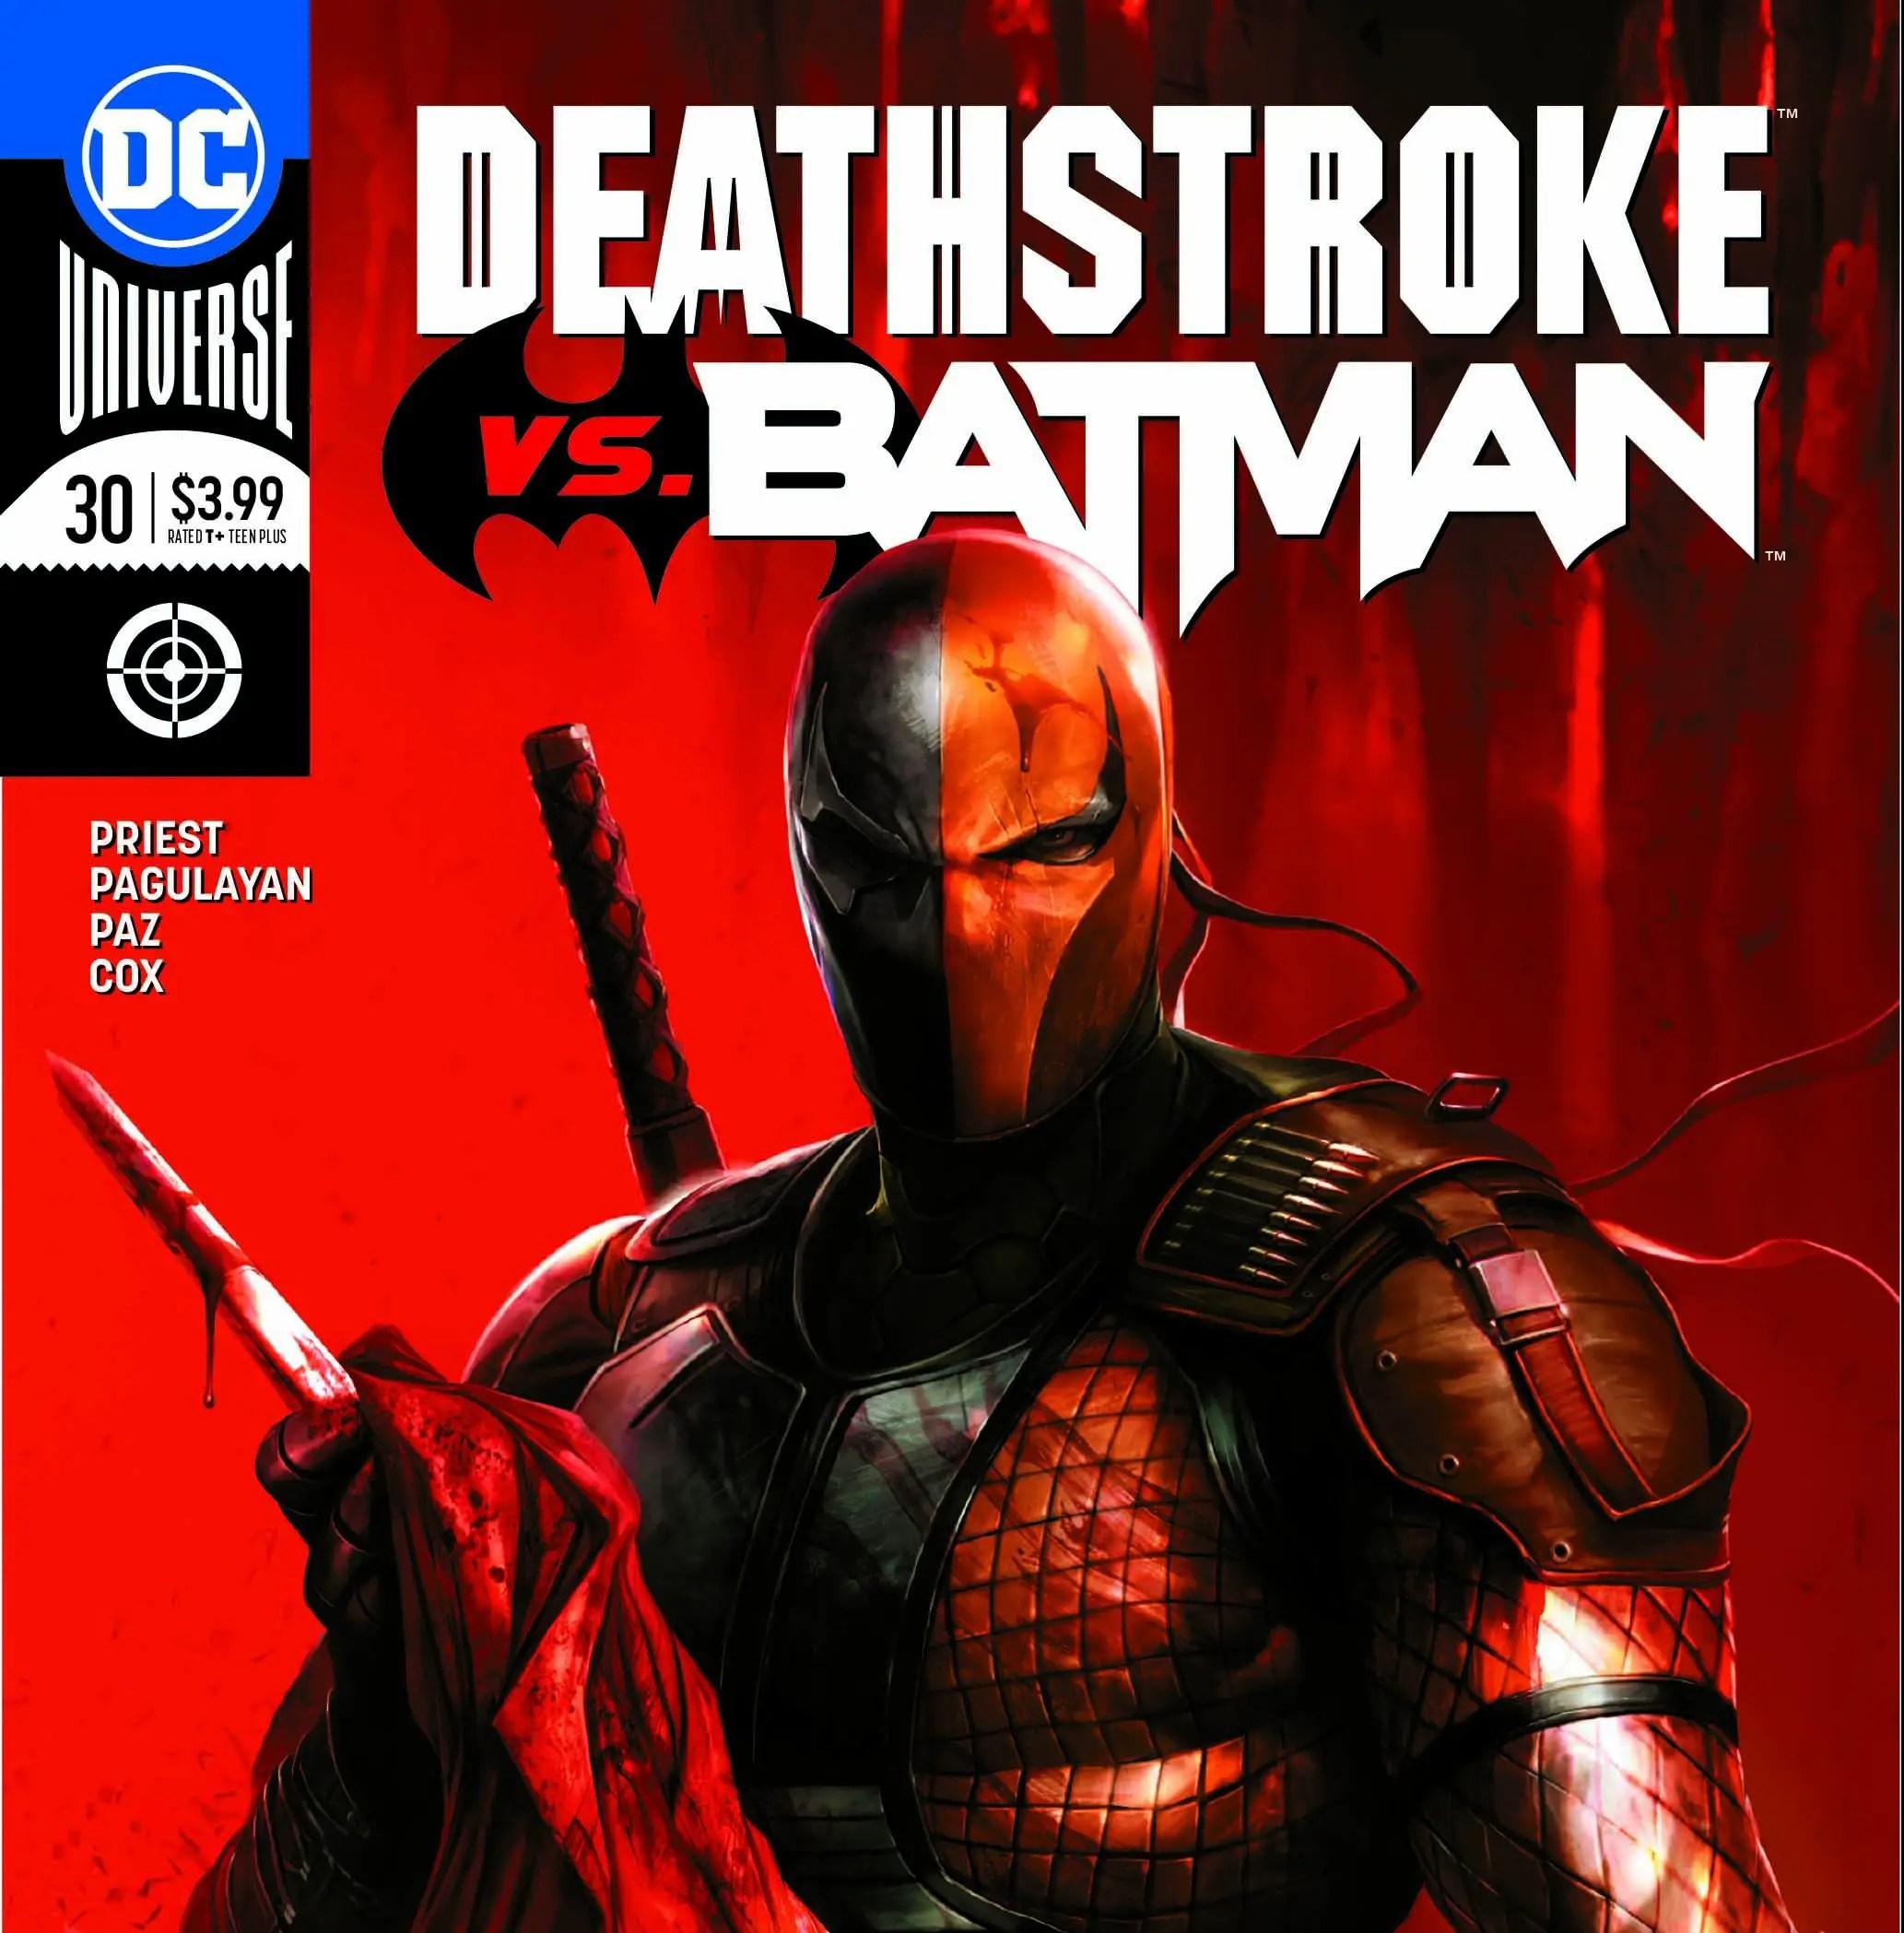 Deathstroke #30 Review